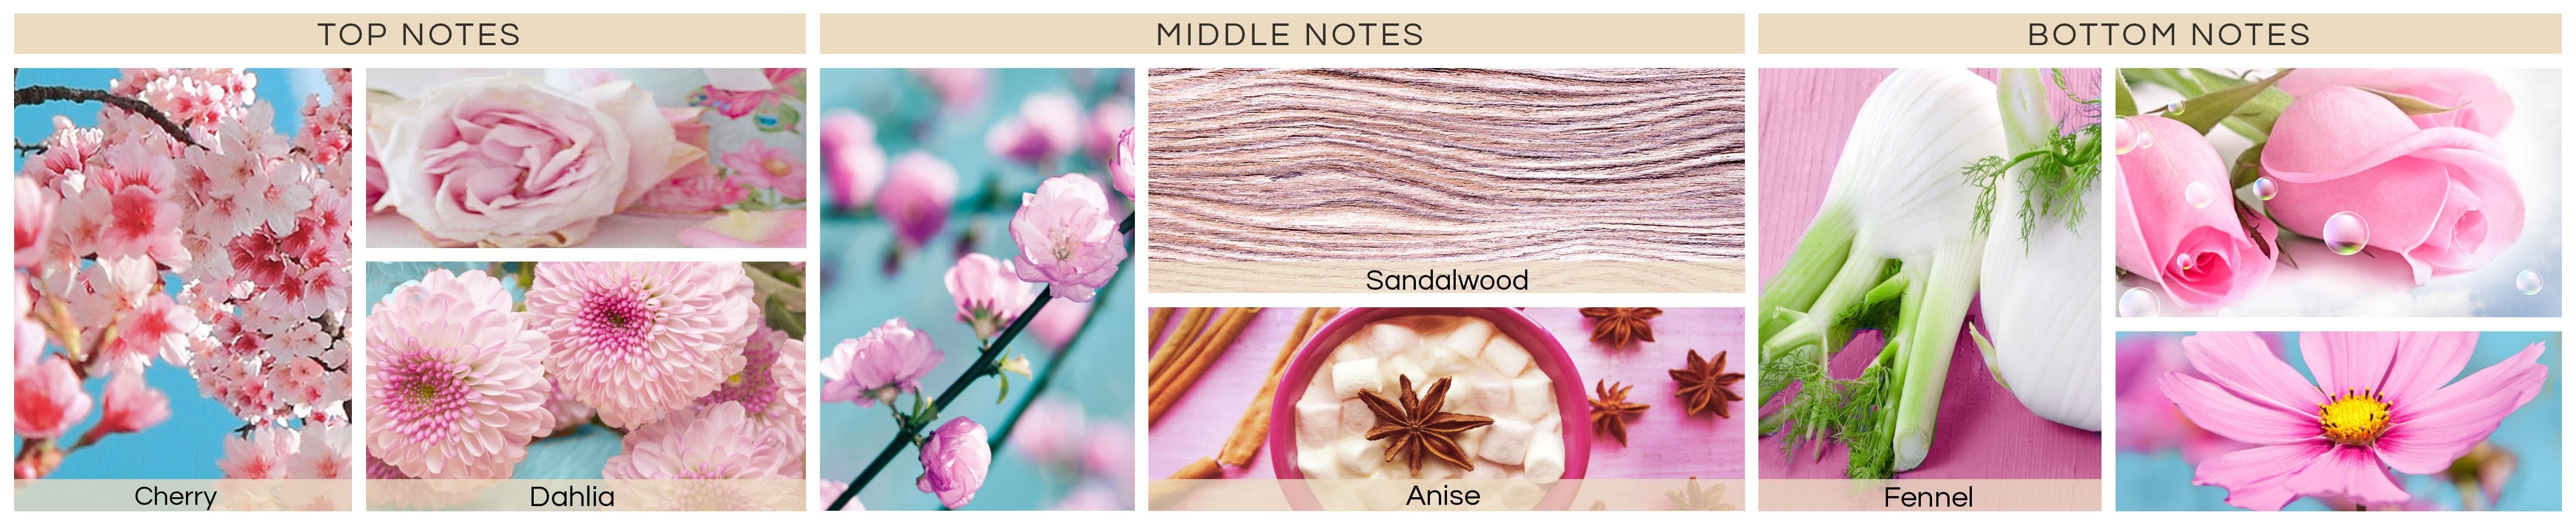 pink-blossom-jpg576030eba85c2-min591c013f45d43